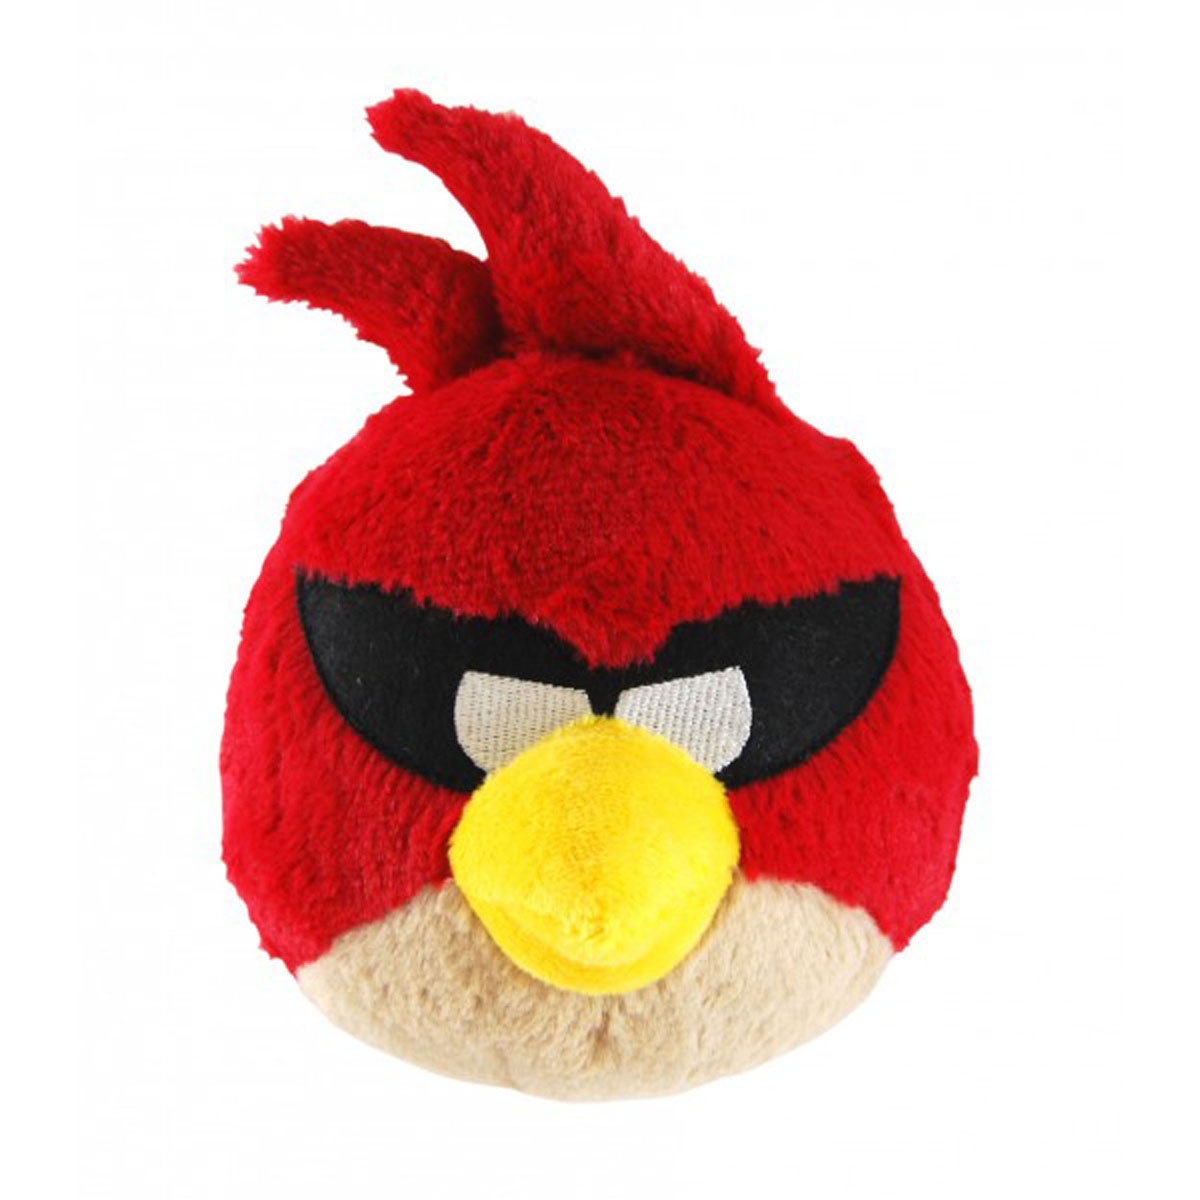 Мягкая игрушка Angry Birds Space, красная птица, со звуком, 40 см